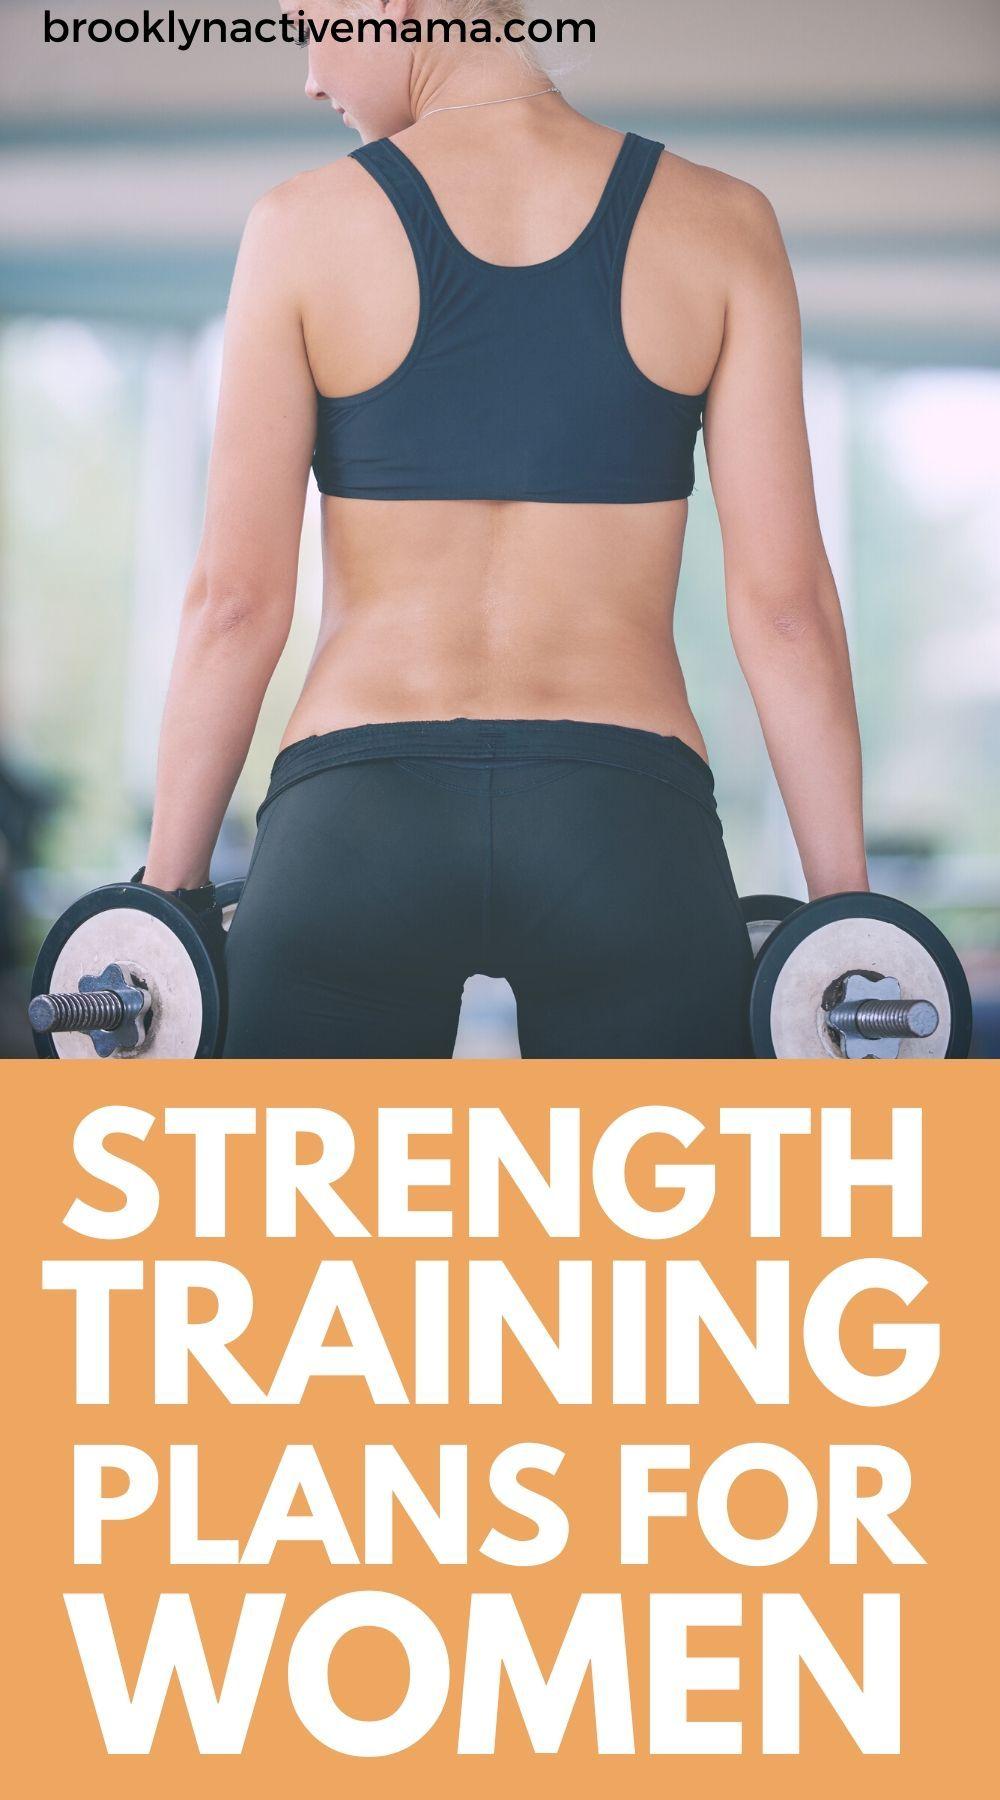 Got Muscle? 9 Beginner Strength Training Routines For Women